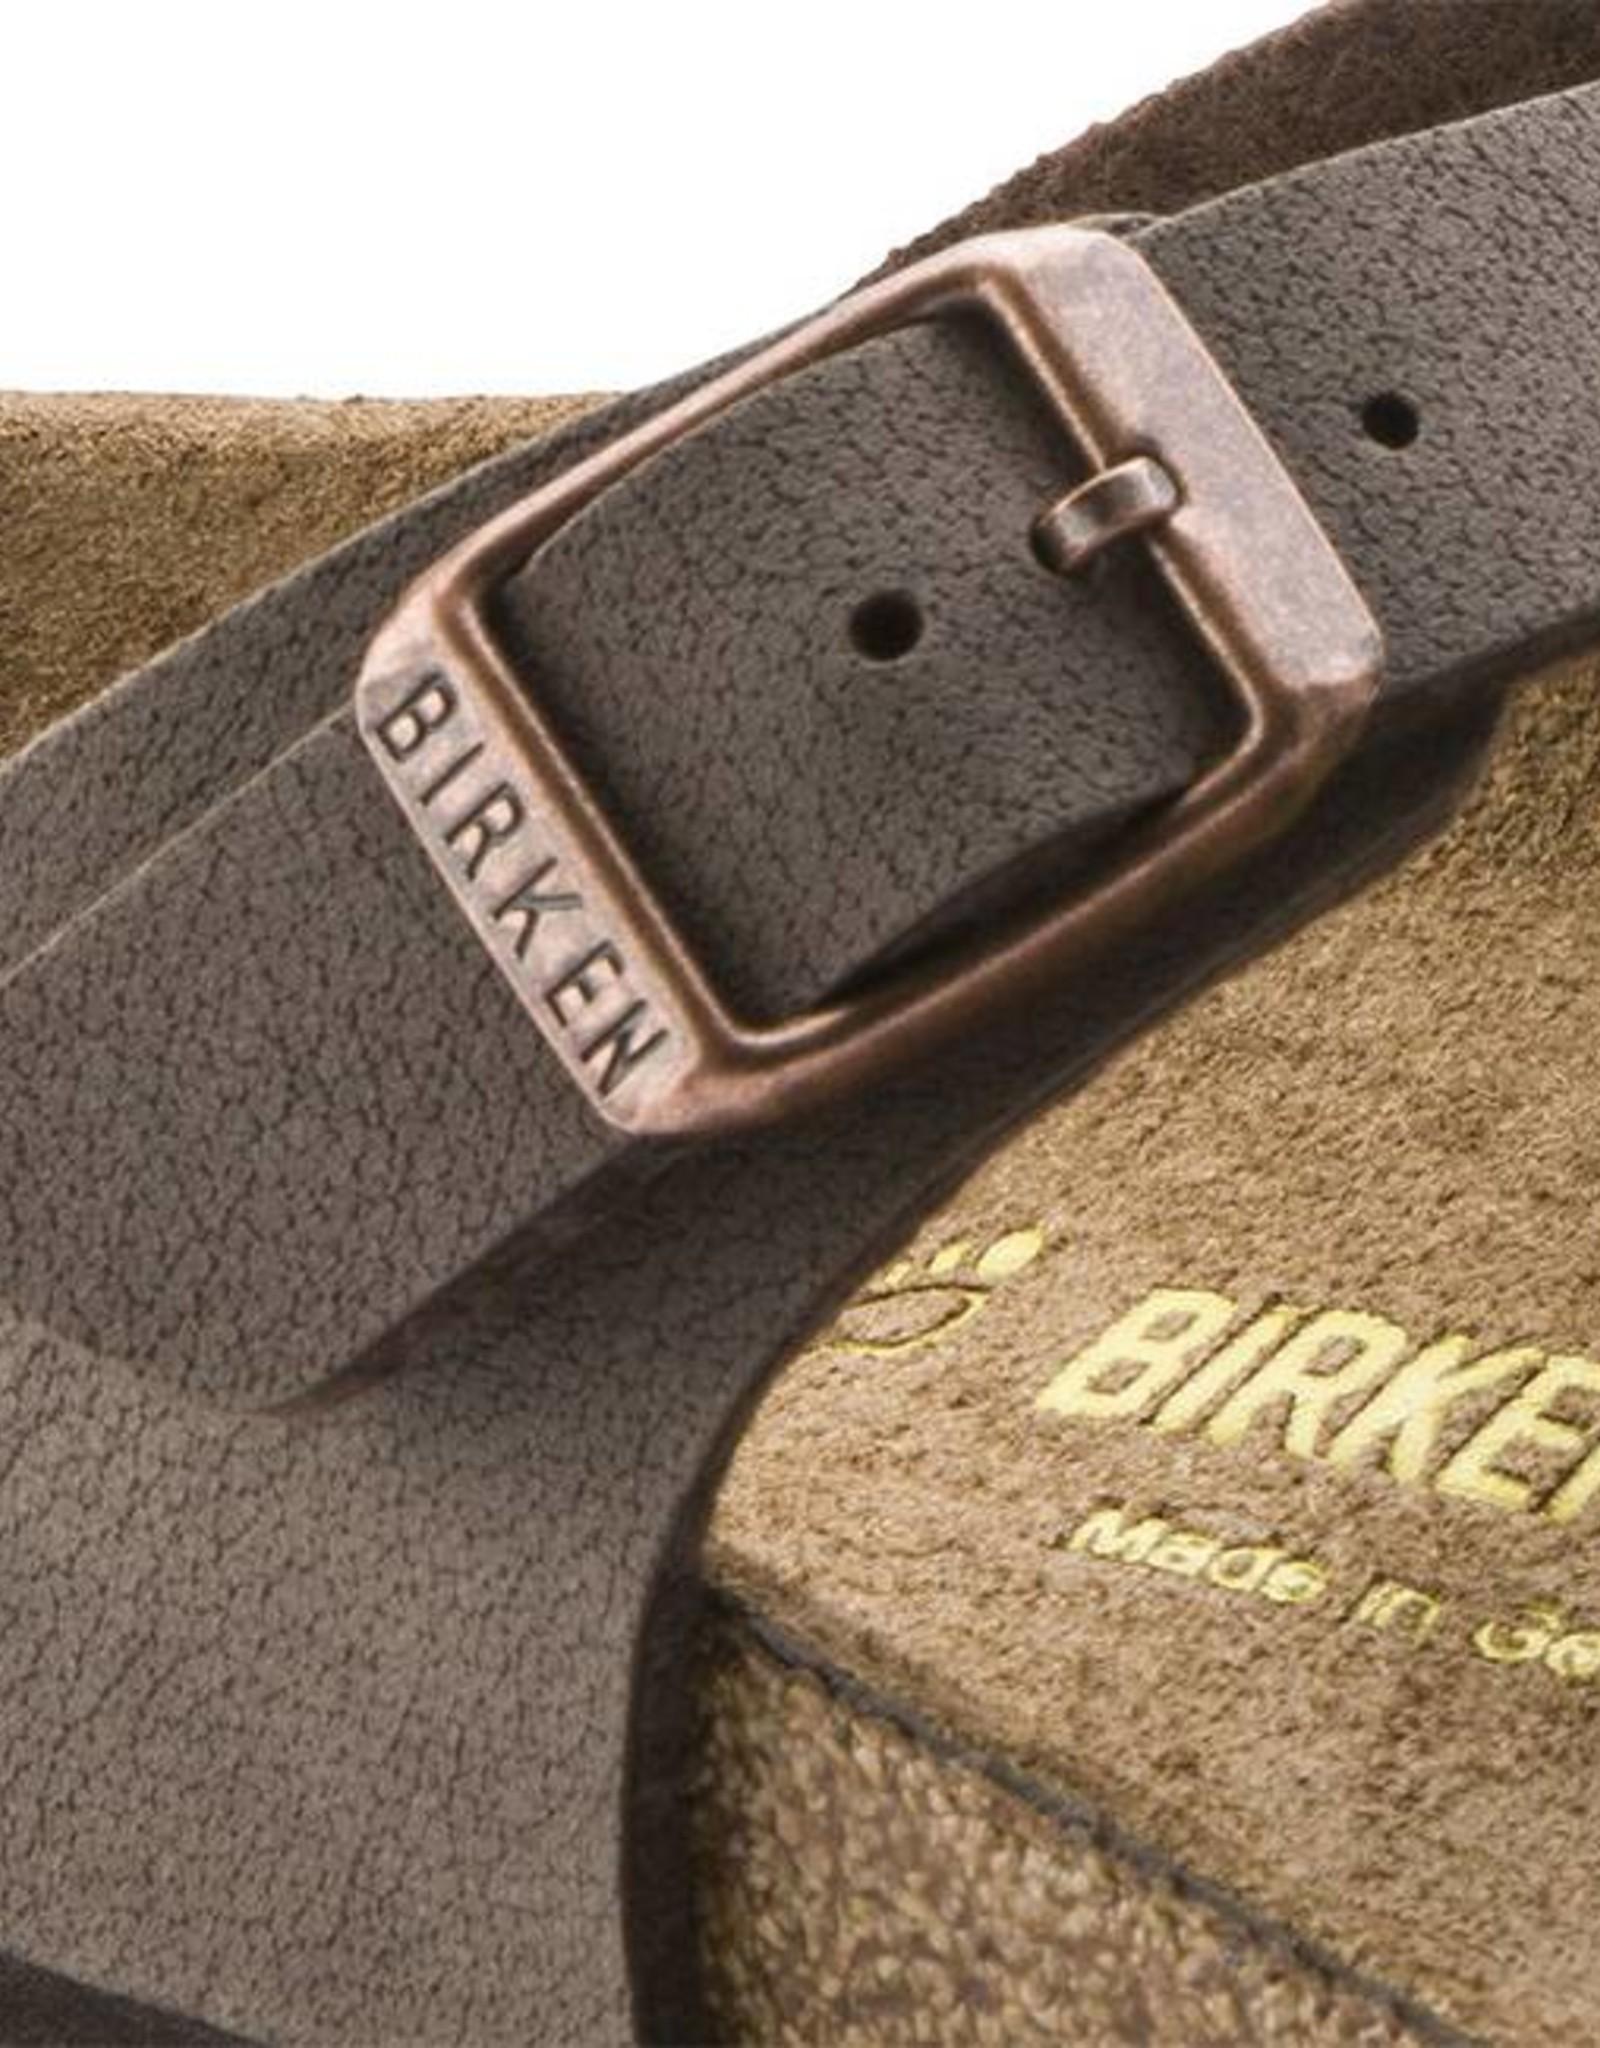 Birkenstock Gizeh Kids - Birko-Flor in Mocca (Classic Footbed - Suede Lined)